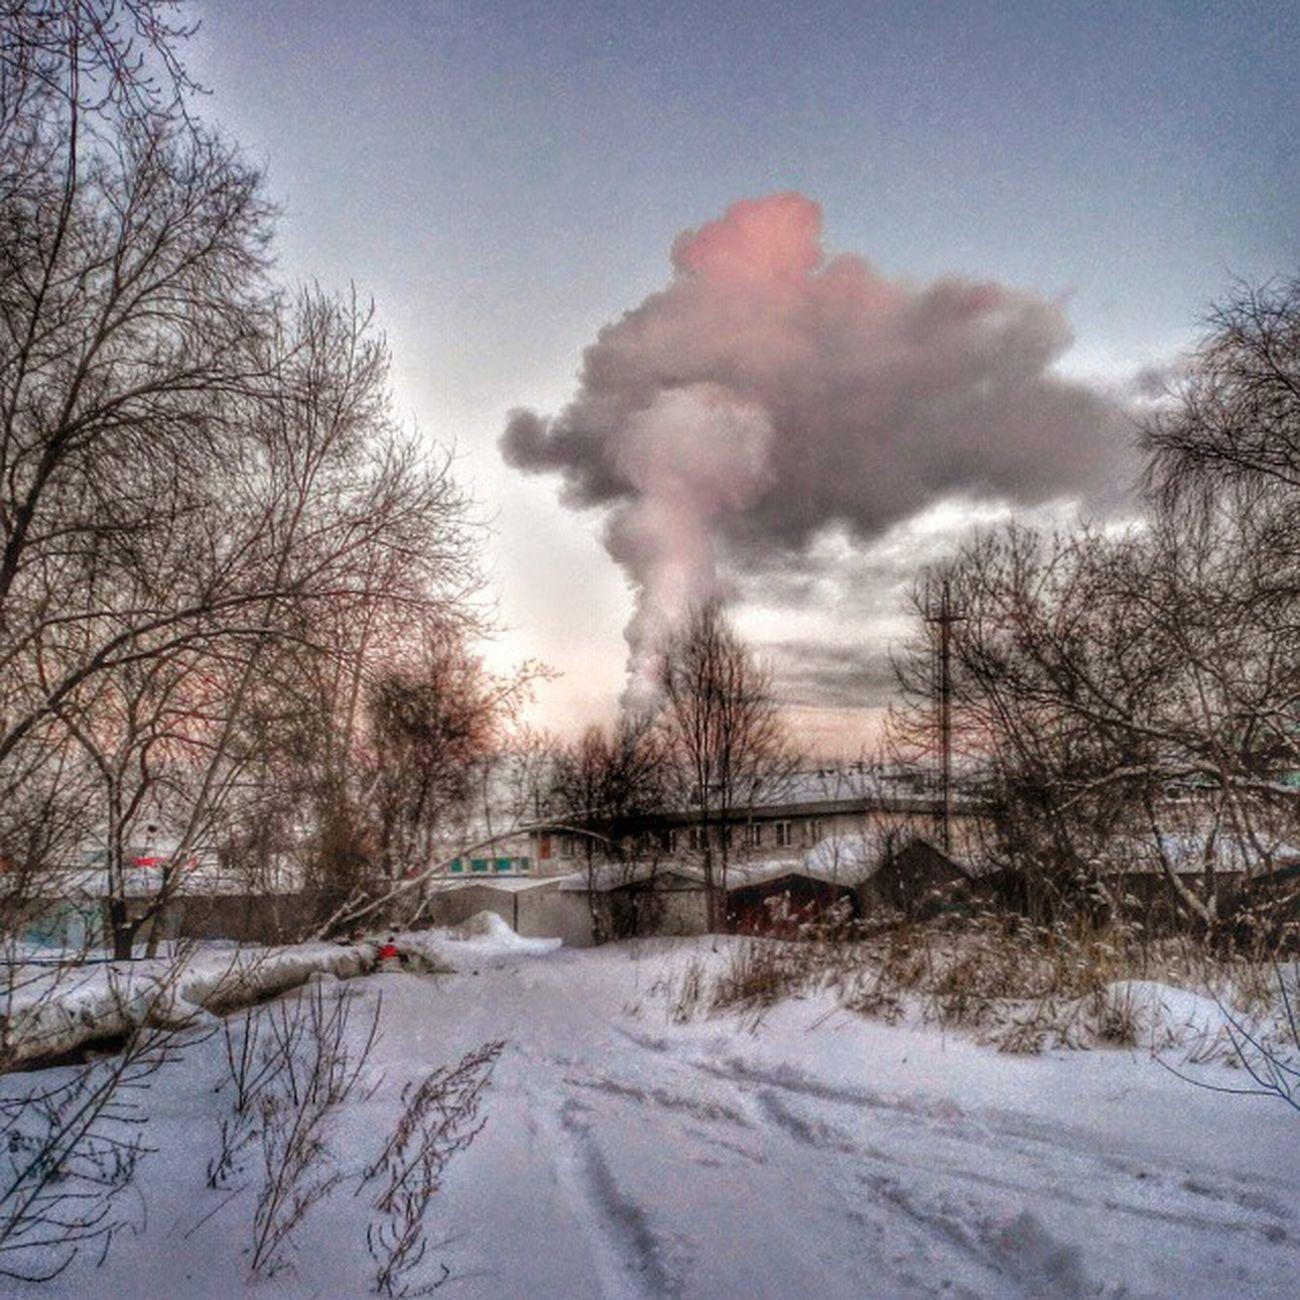 омск сибирь небомореоблака Морозисолнце дым мороз зима январь индастриал Omsk Siberia Frostandsun Smoke Frost January Winter Snow Industrial Instaomsk15